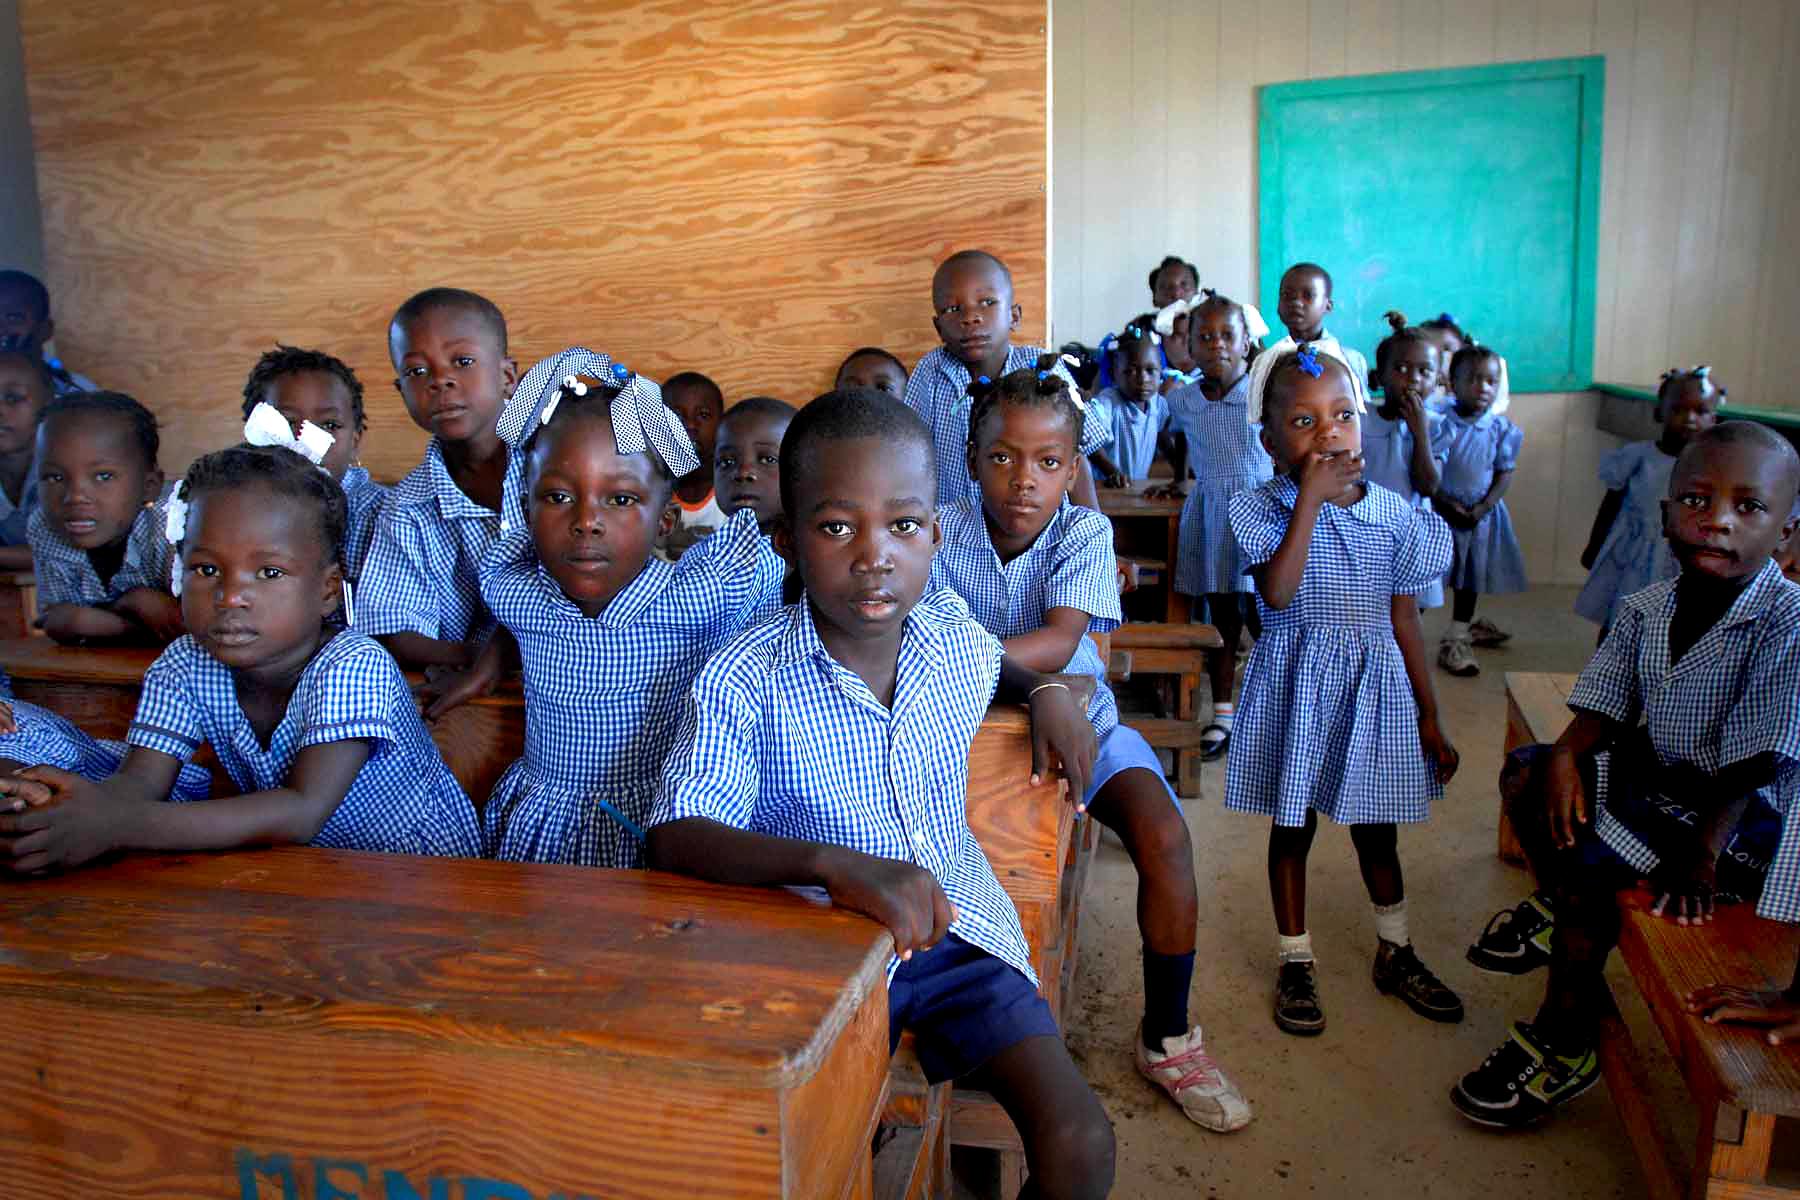 Helping Hands 4 Haiti Helping Haitian Families